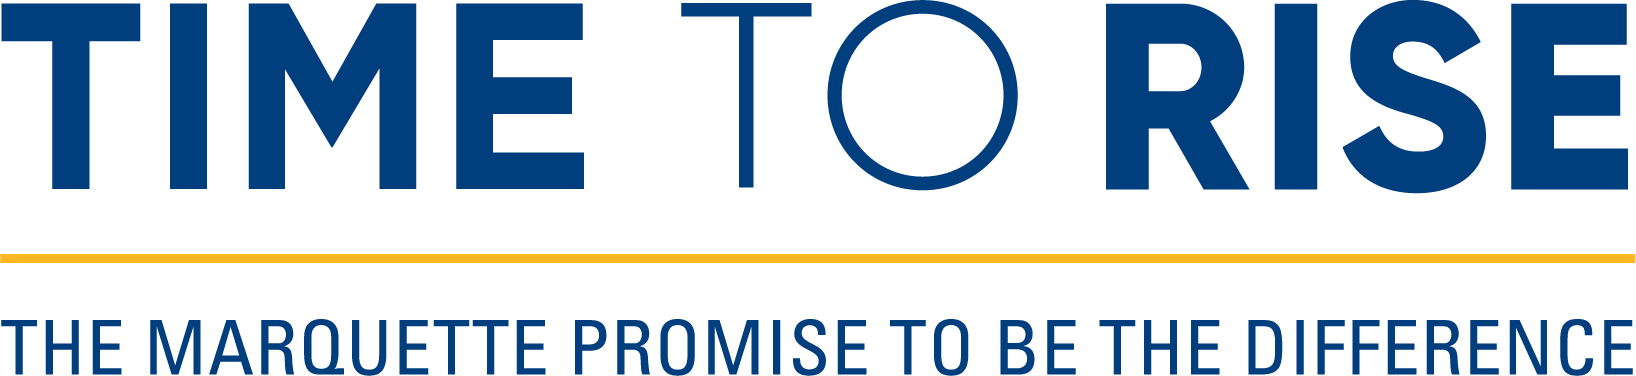 Campaign Wordmark - Header